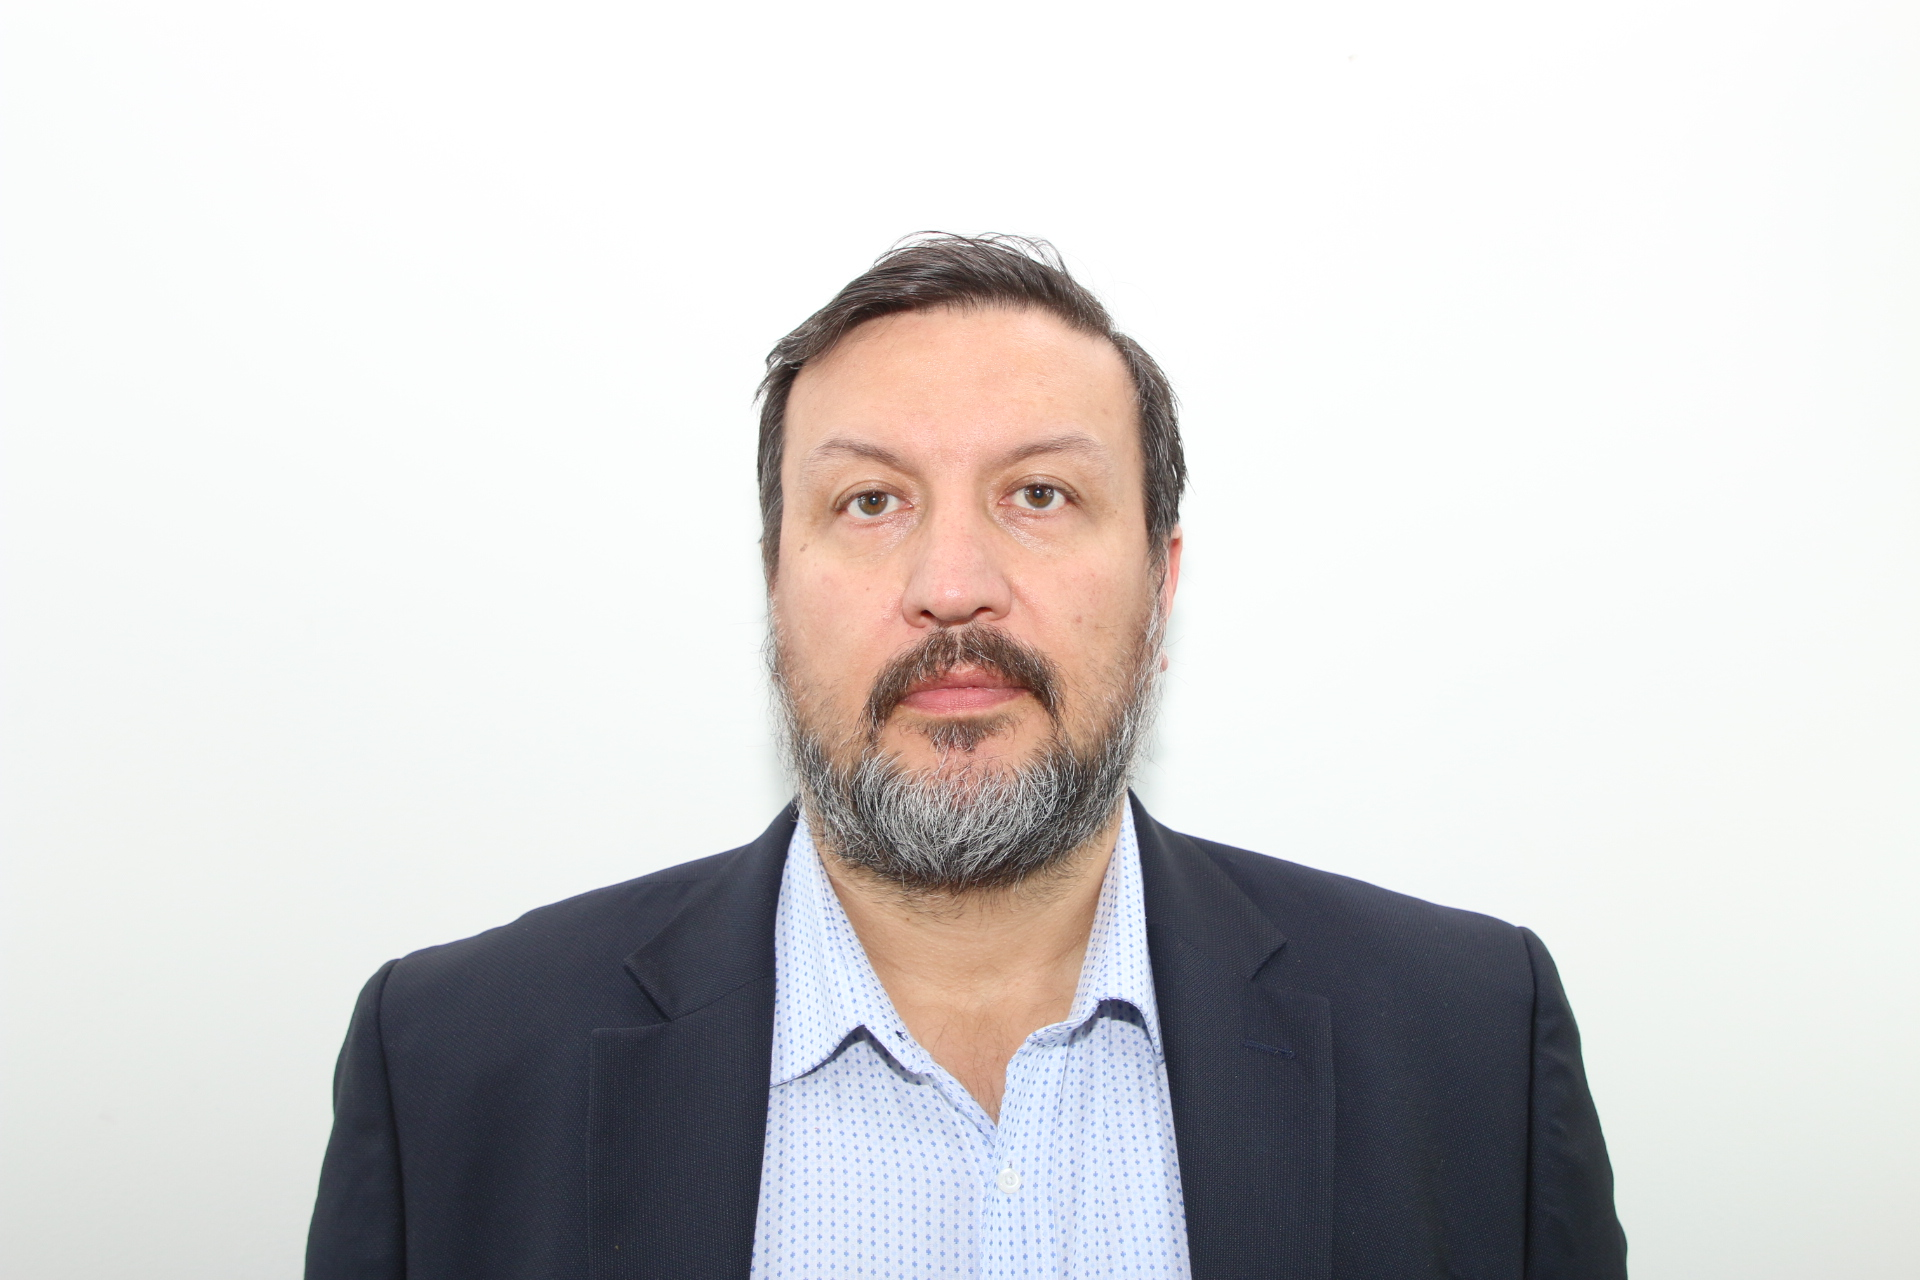 José Alejandro Cascante Chaves